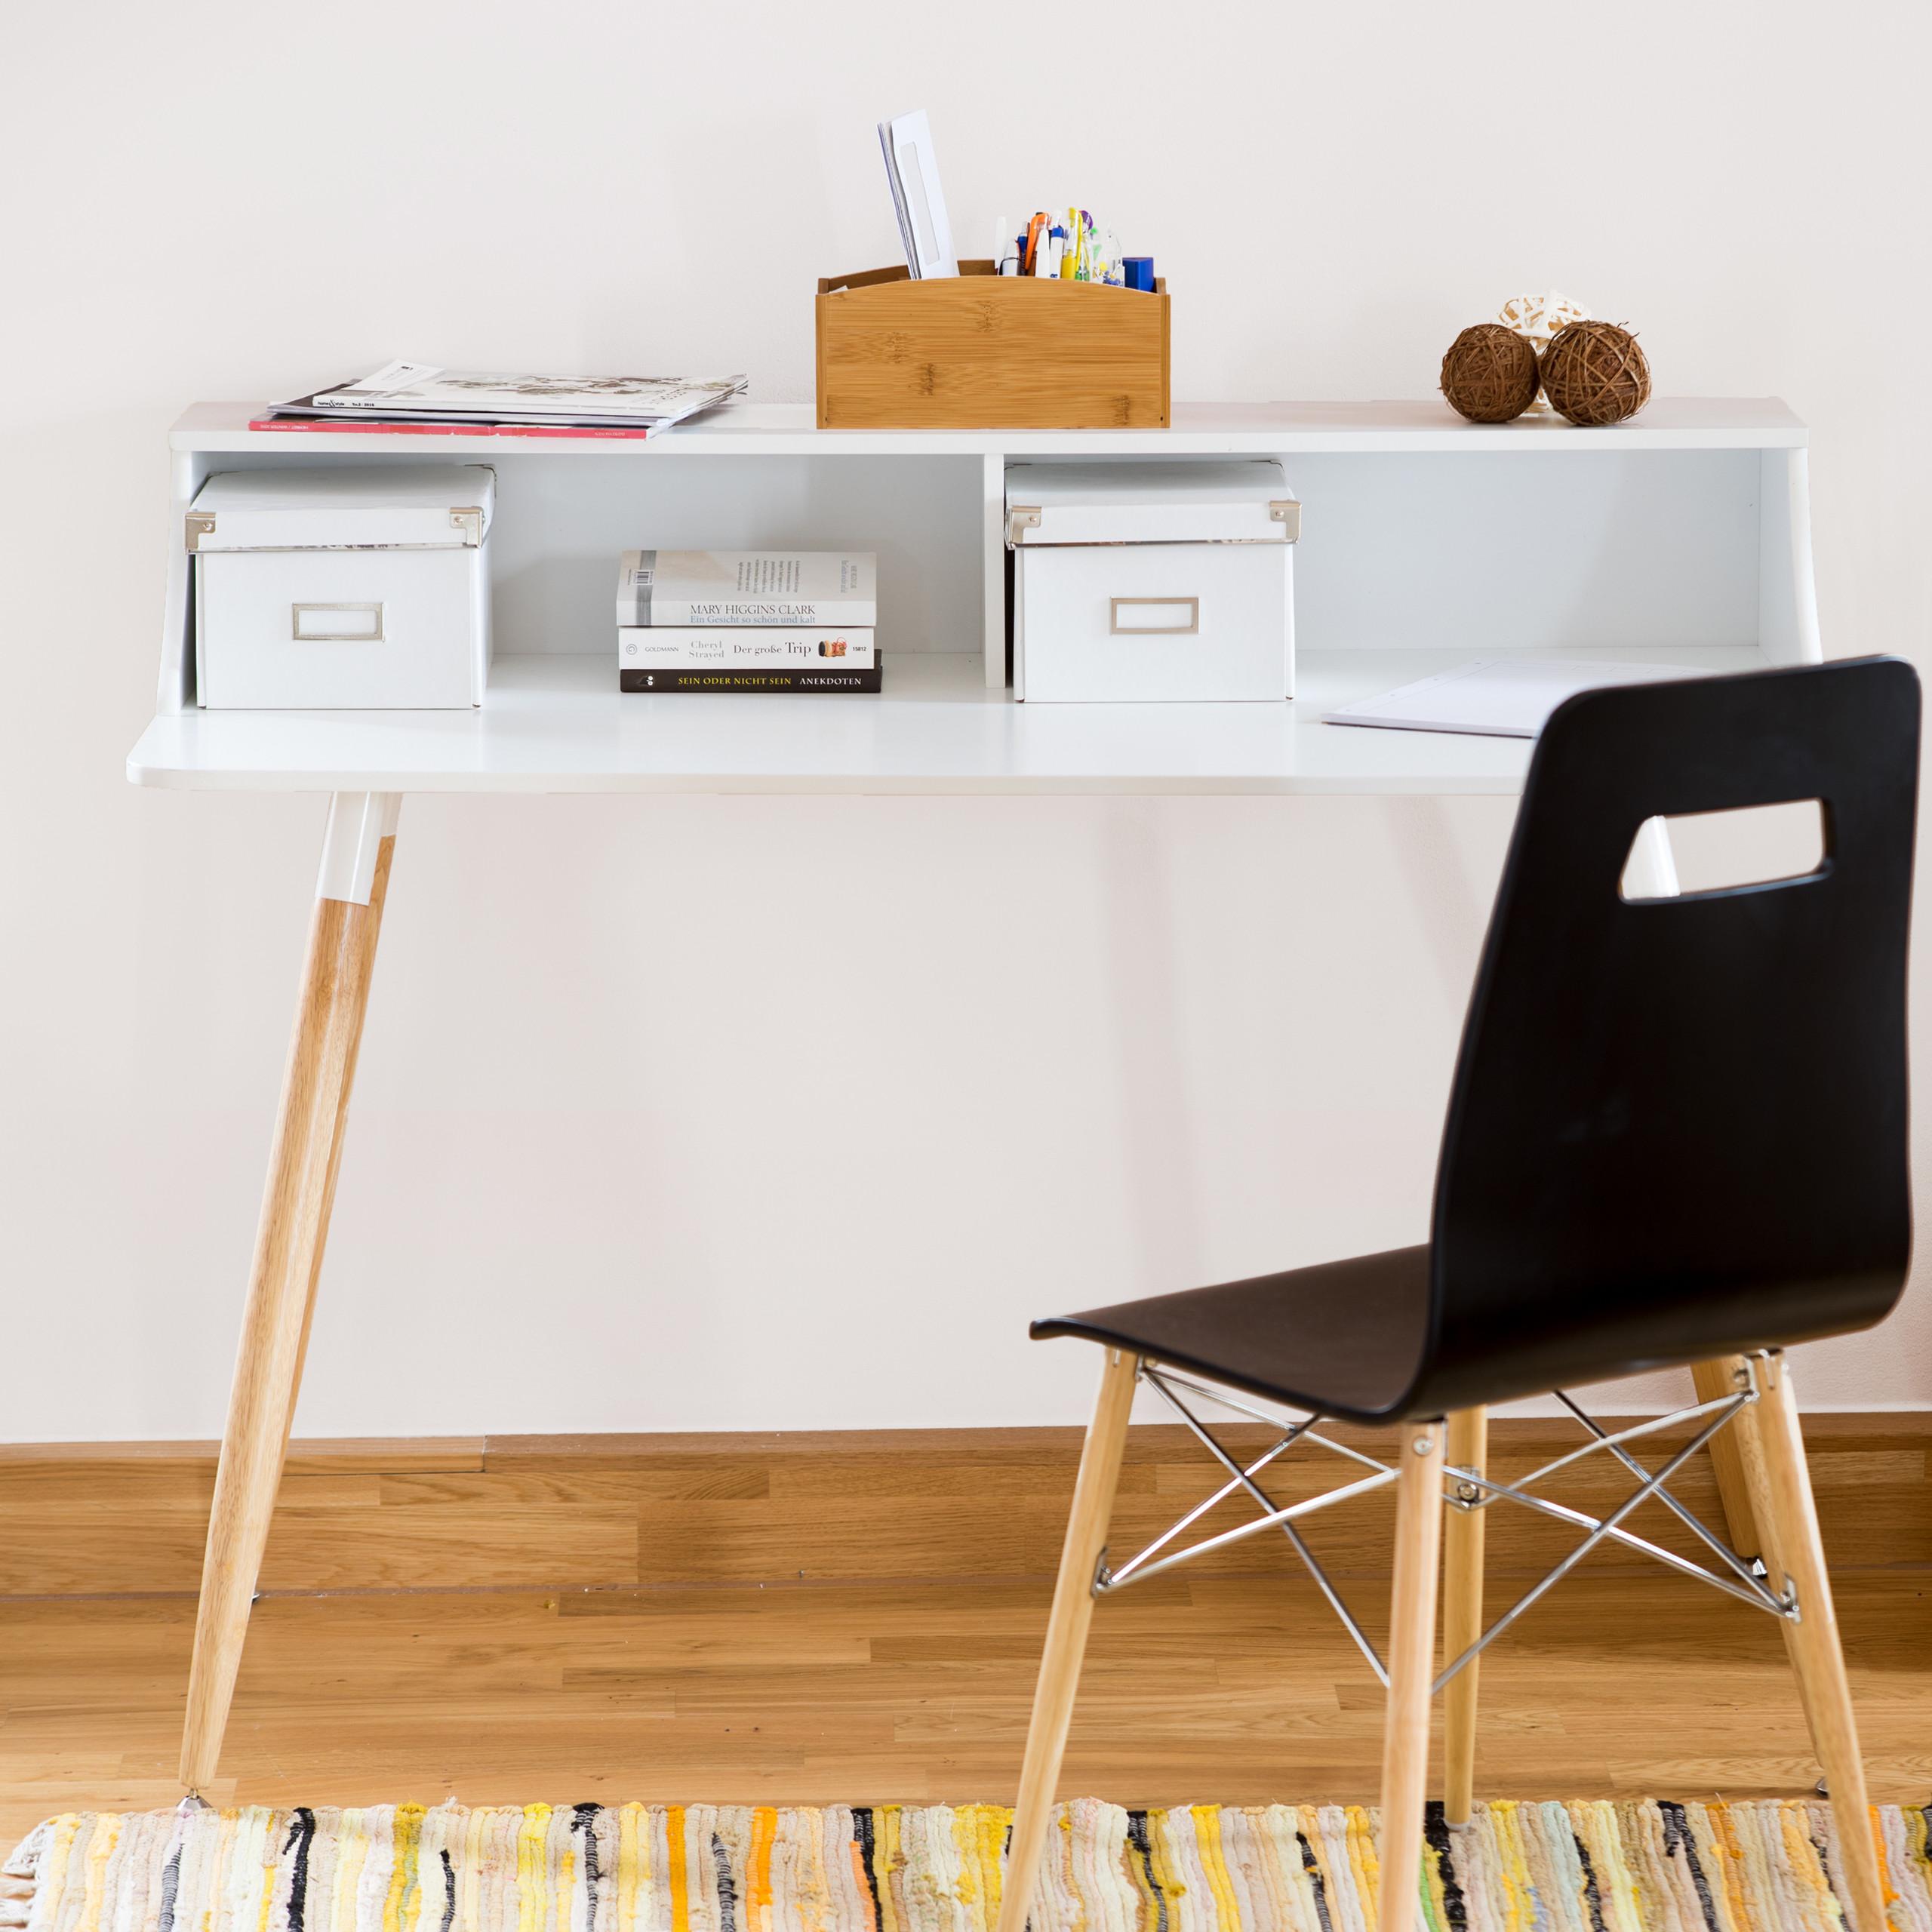 bureau-kinderbureau-ruimtebesparend-75-cm-hoog-laptoptafel-120-breed miniatuur 4